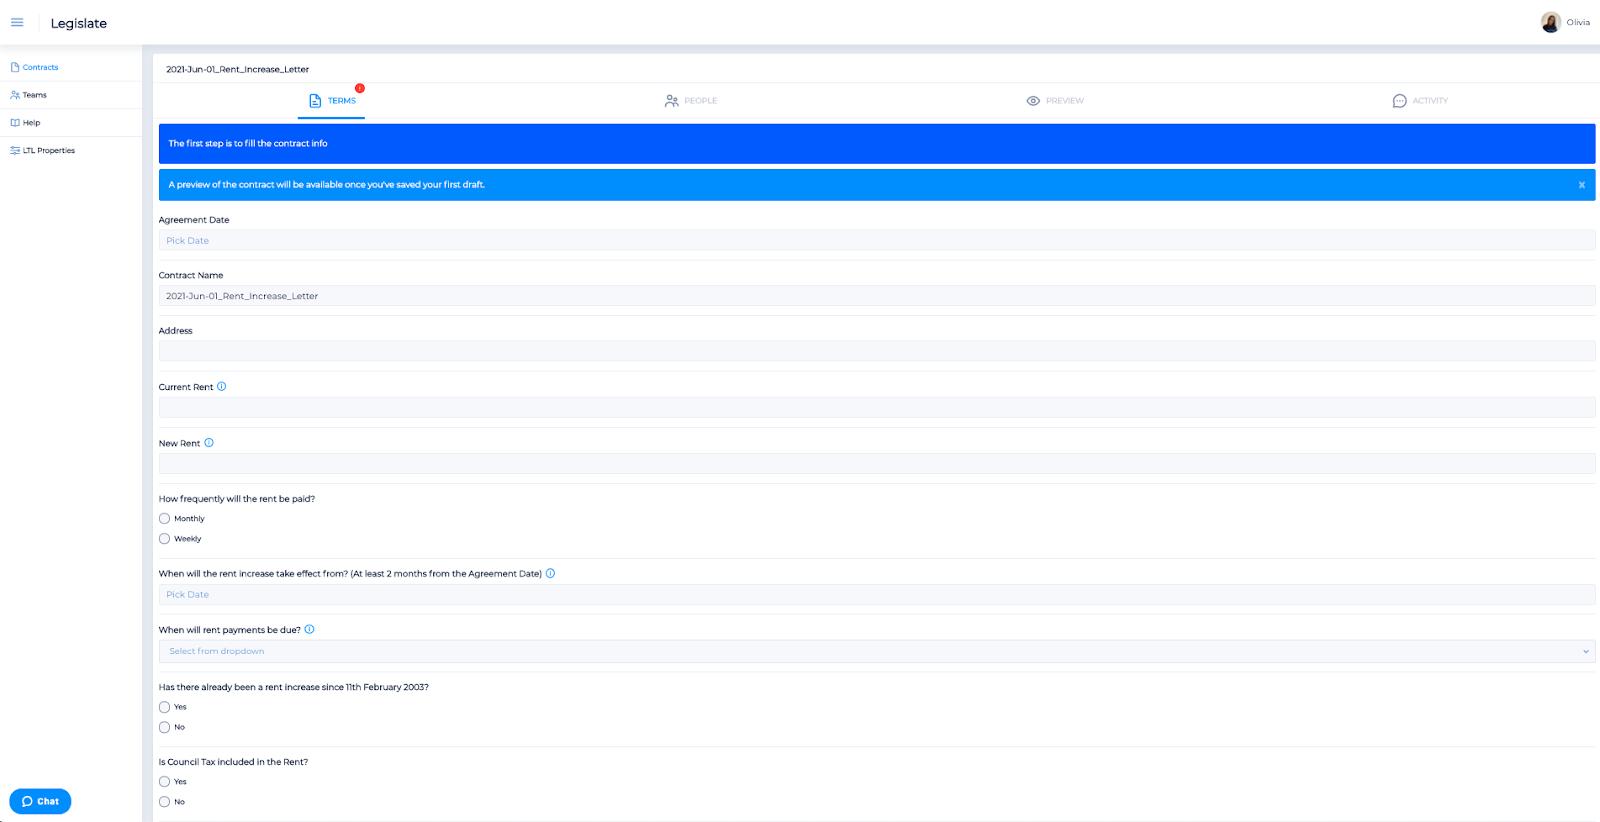 Screenshot of the Legislate terms tab